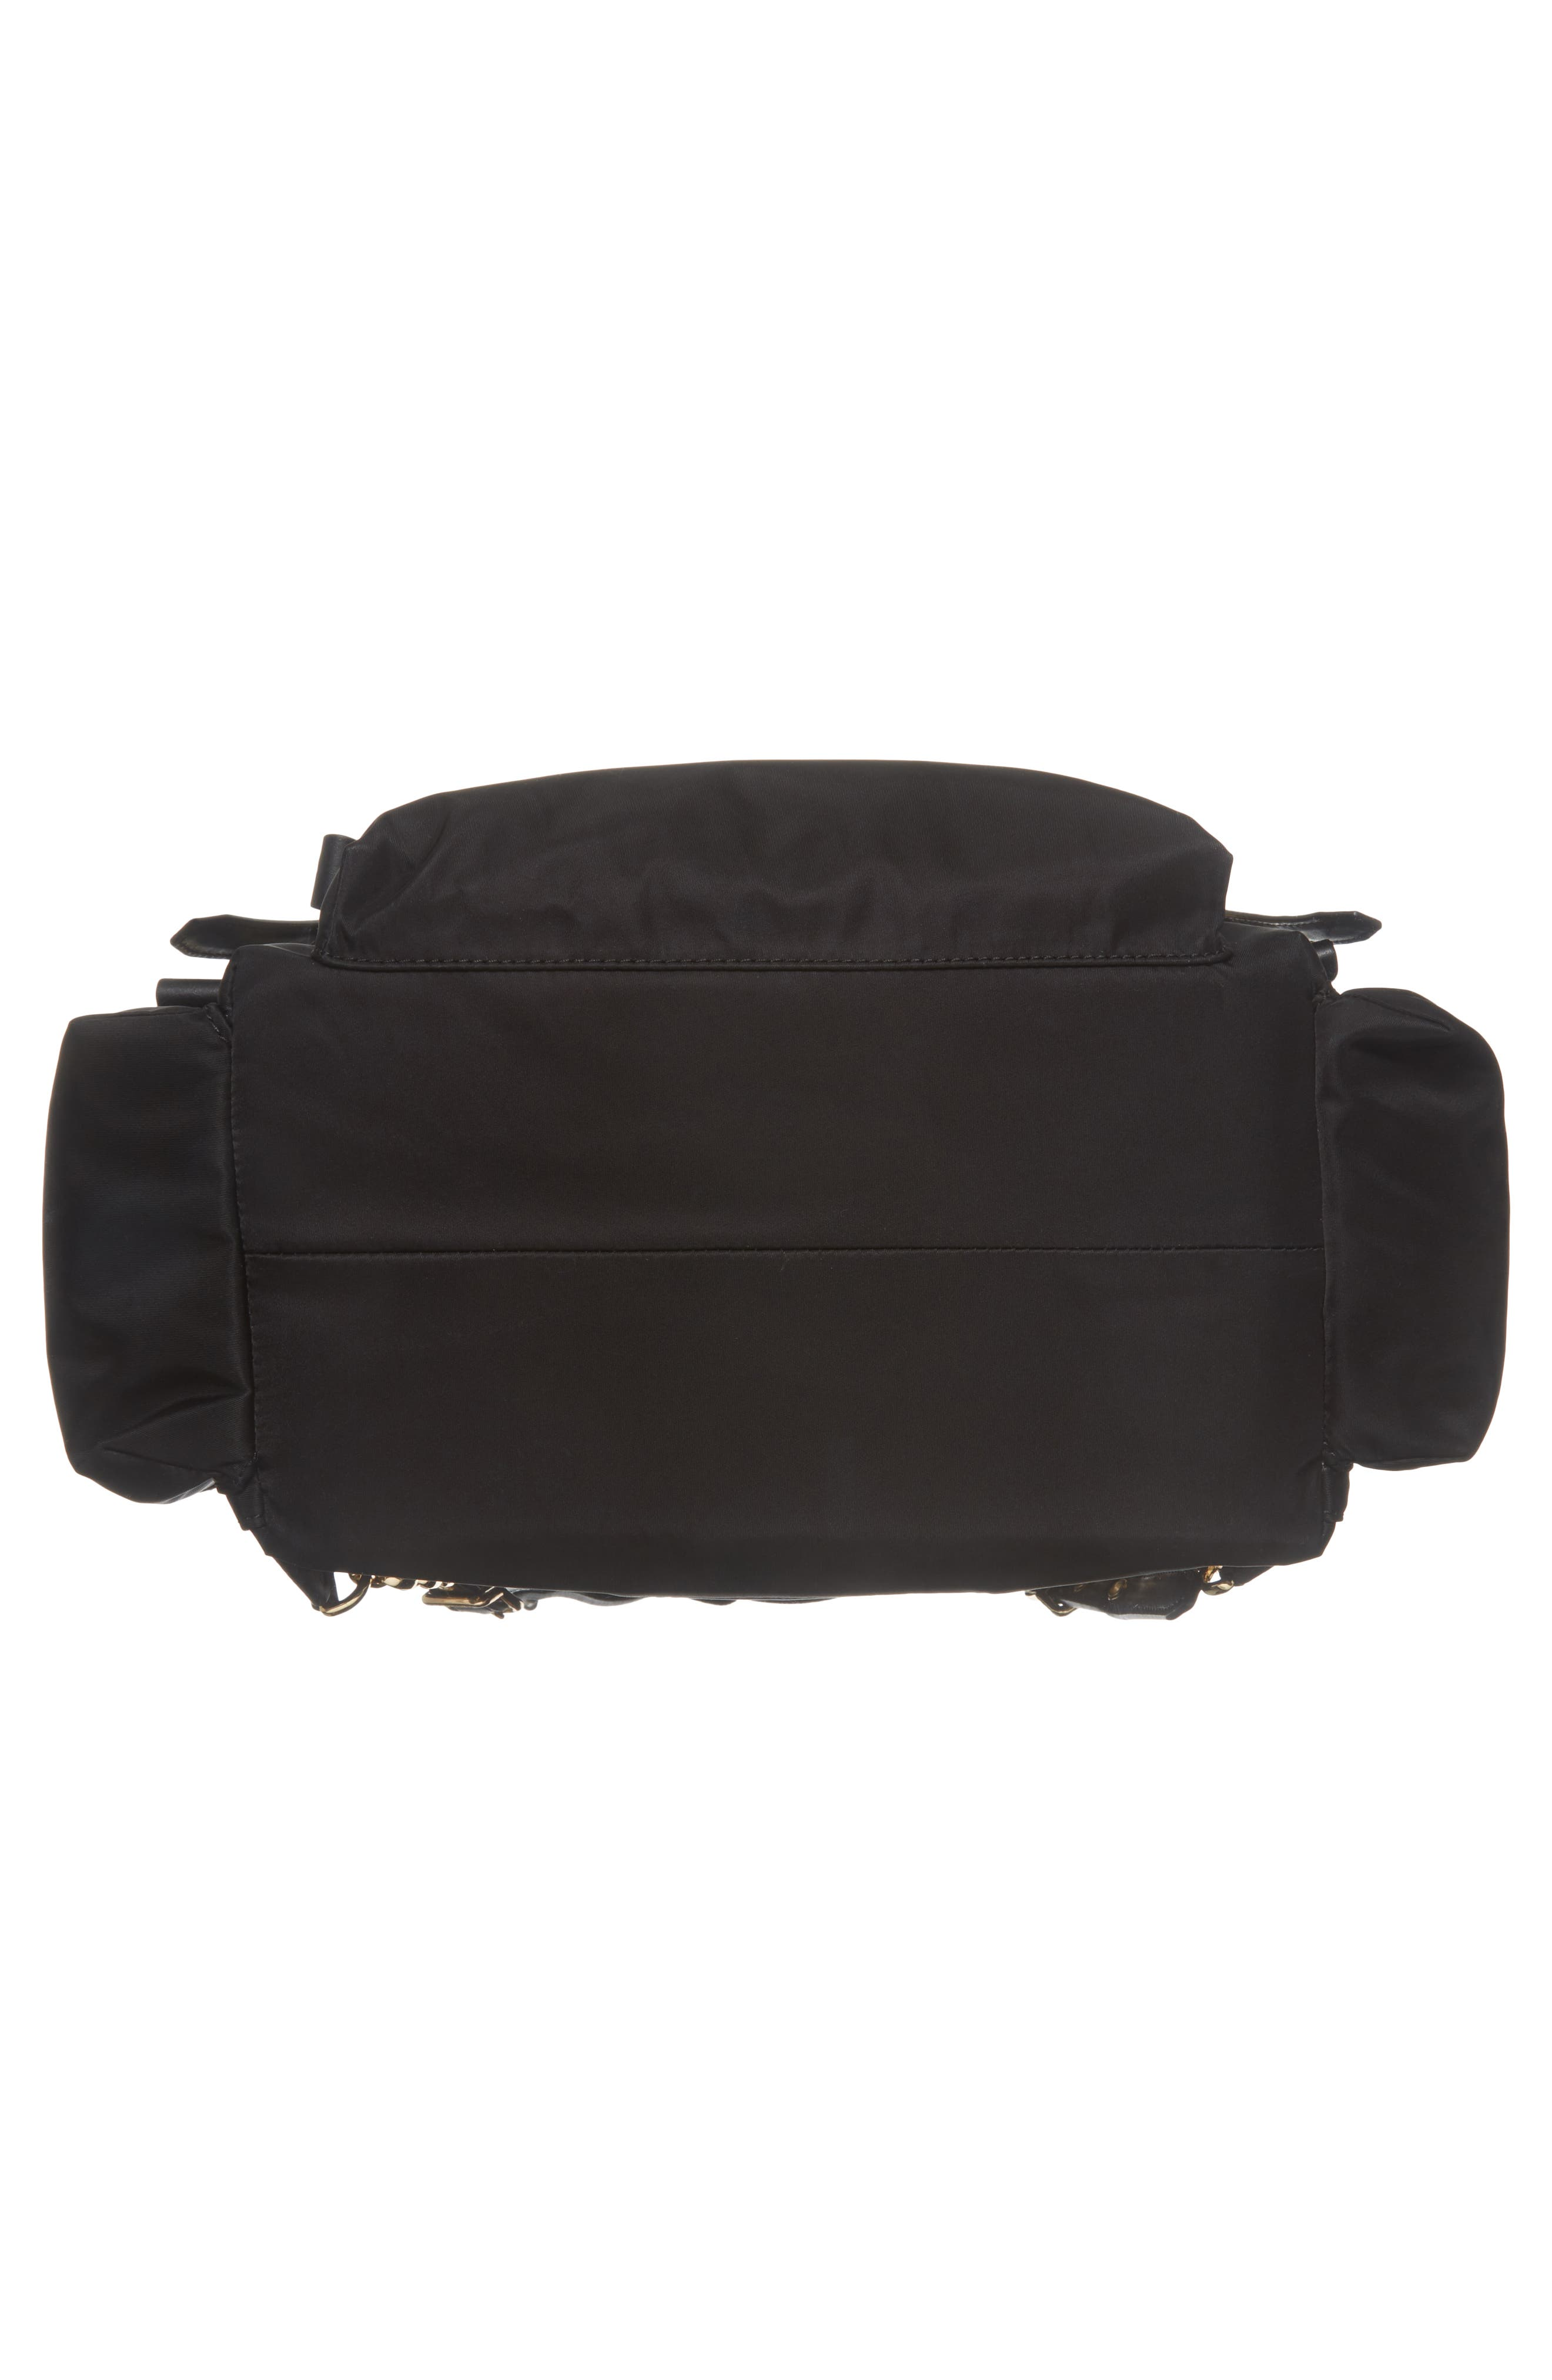 Large Nylon Diaper Backpack,                             Alternate thumbnail 6, color,                             001